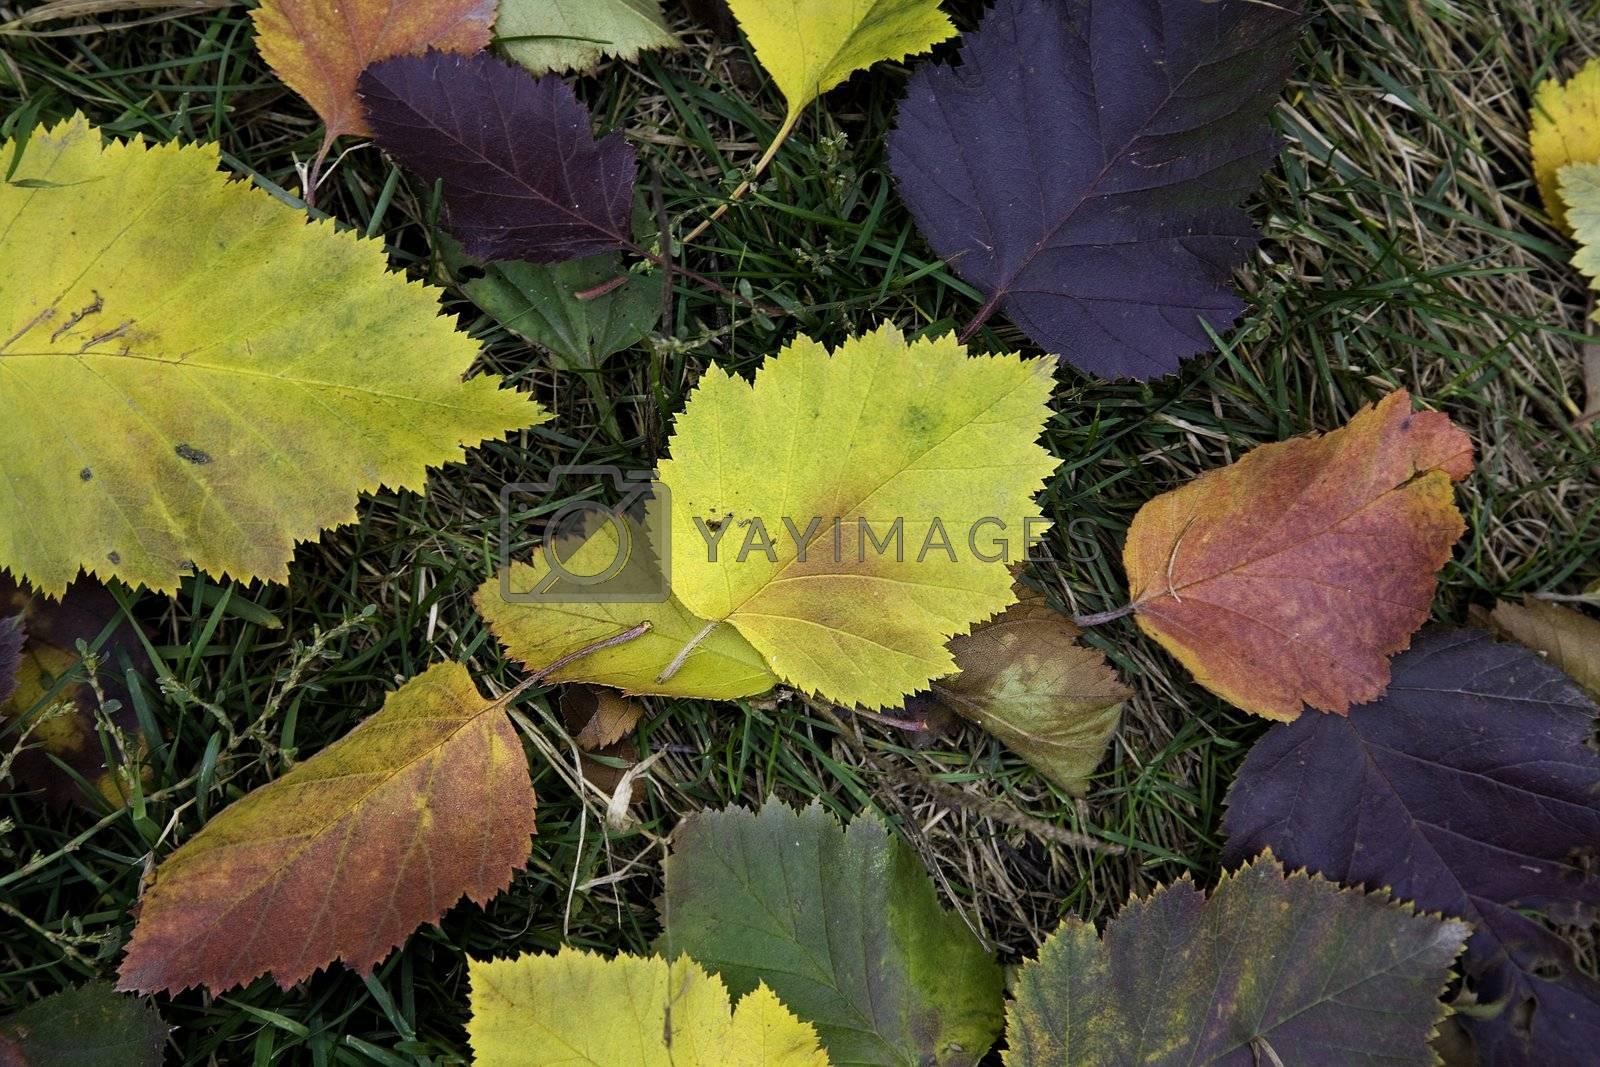 focus point on the center, autumn concept